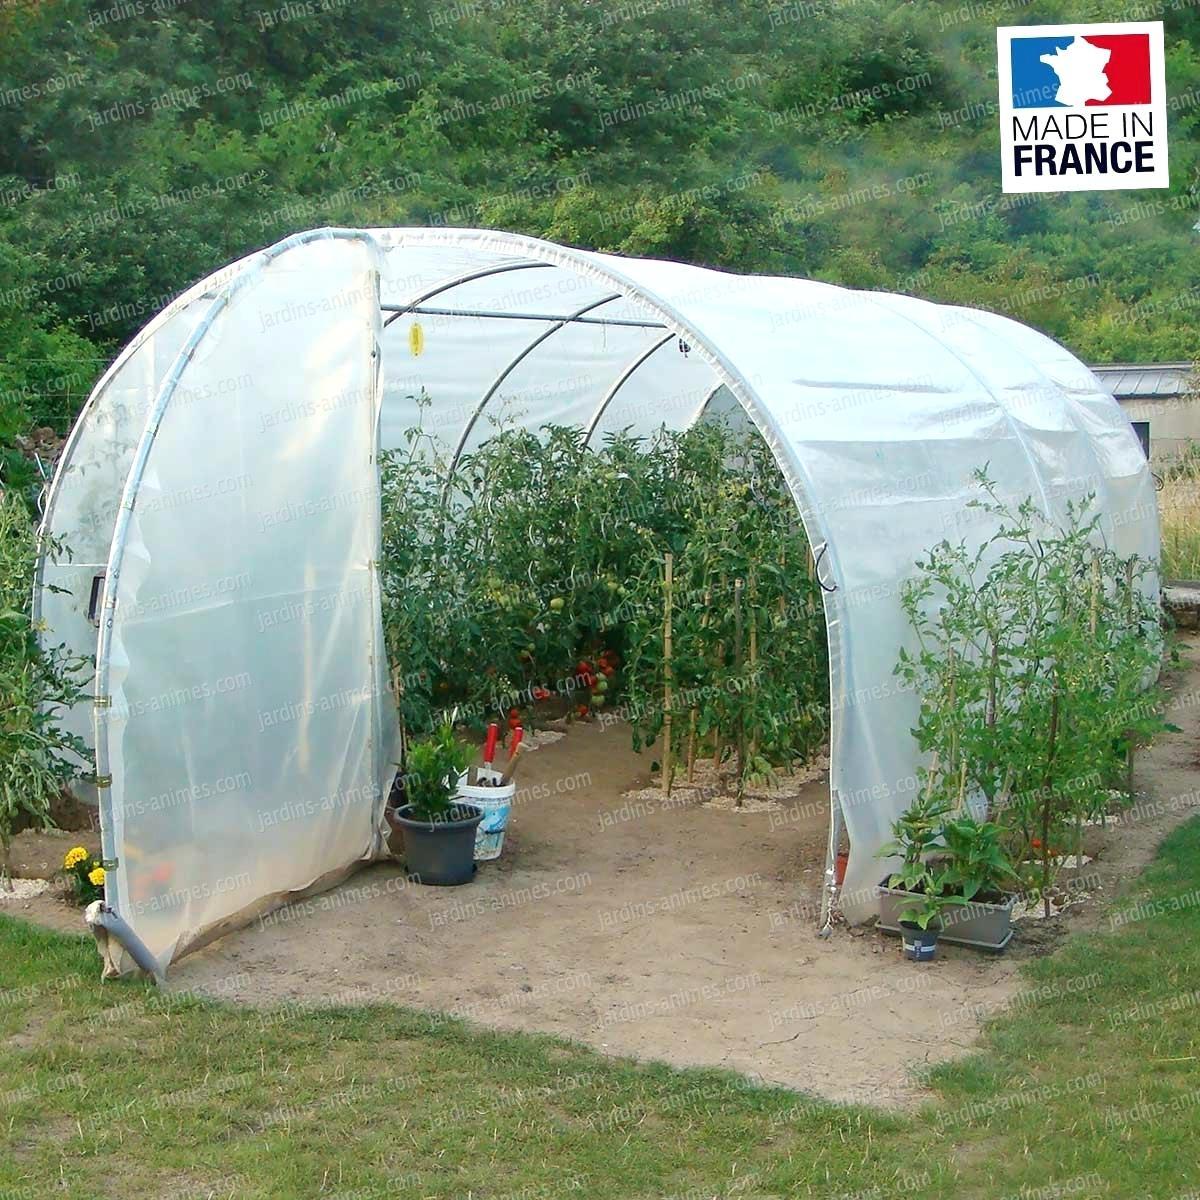 Serre Tunnel De Jardin Belgique - Veranda Et Abri Jardin intérieur Serre De Jardin Belgique